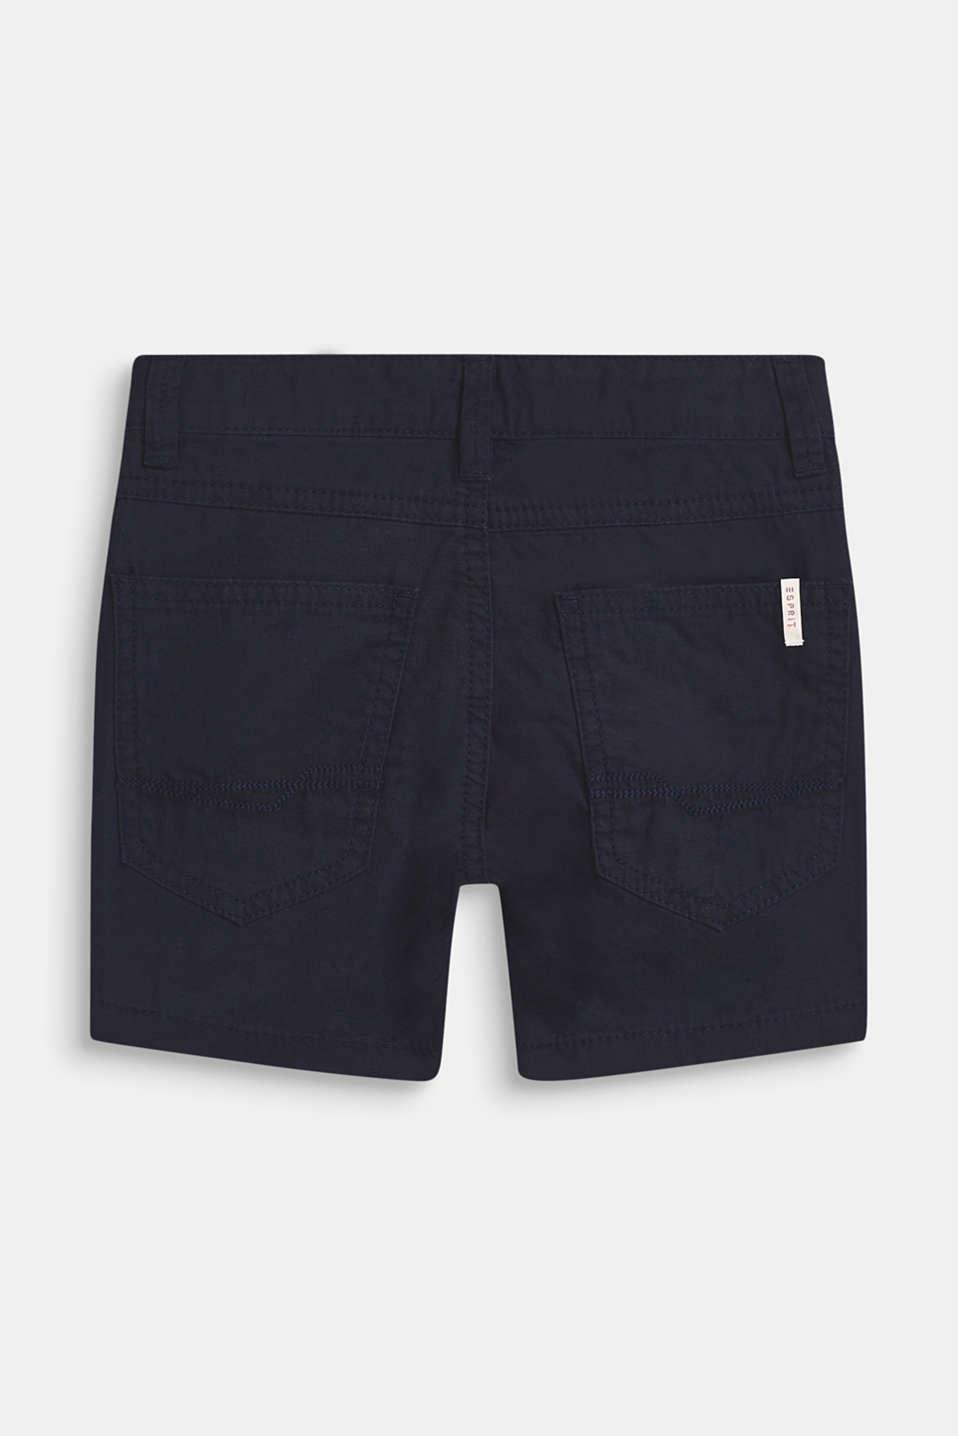 shorts in 100% cotton, BLEU NAVY, detail image number 1